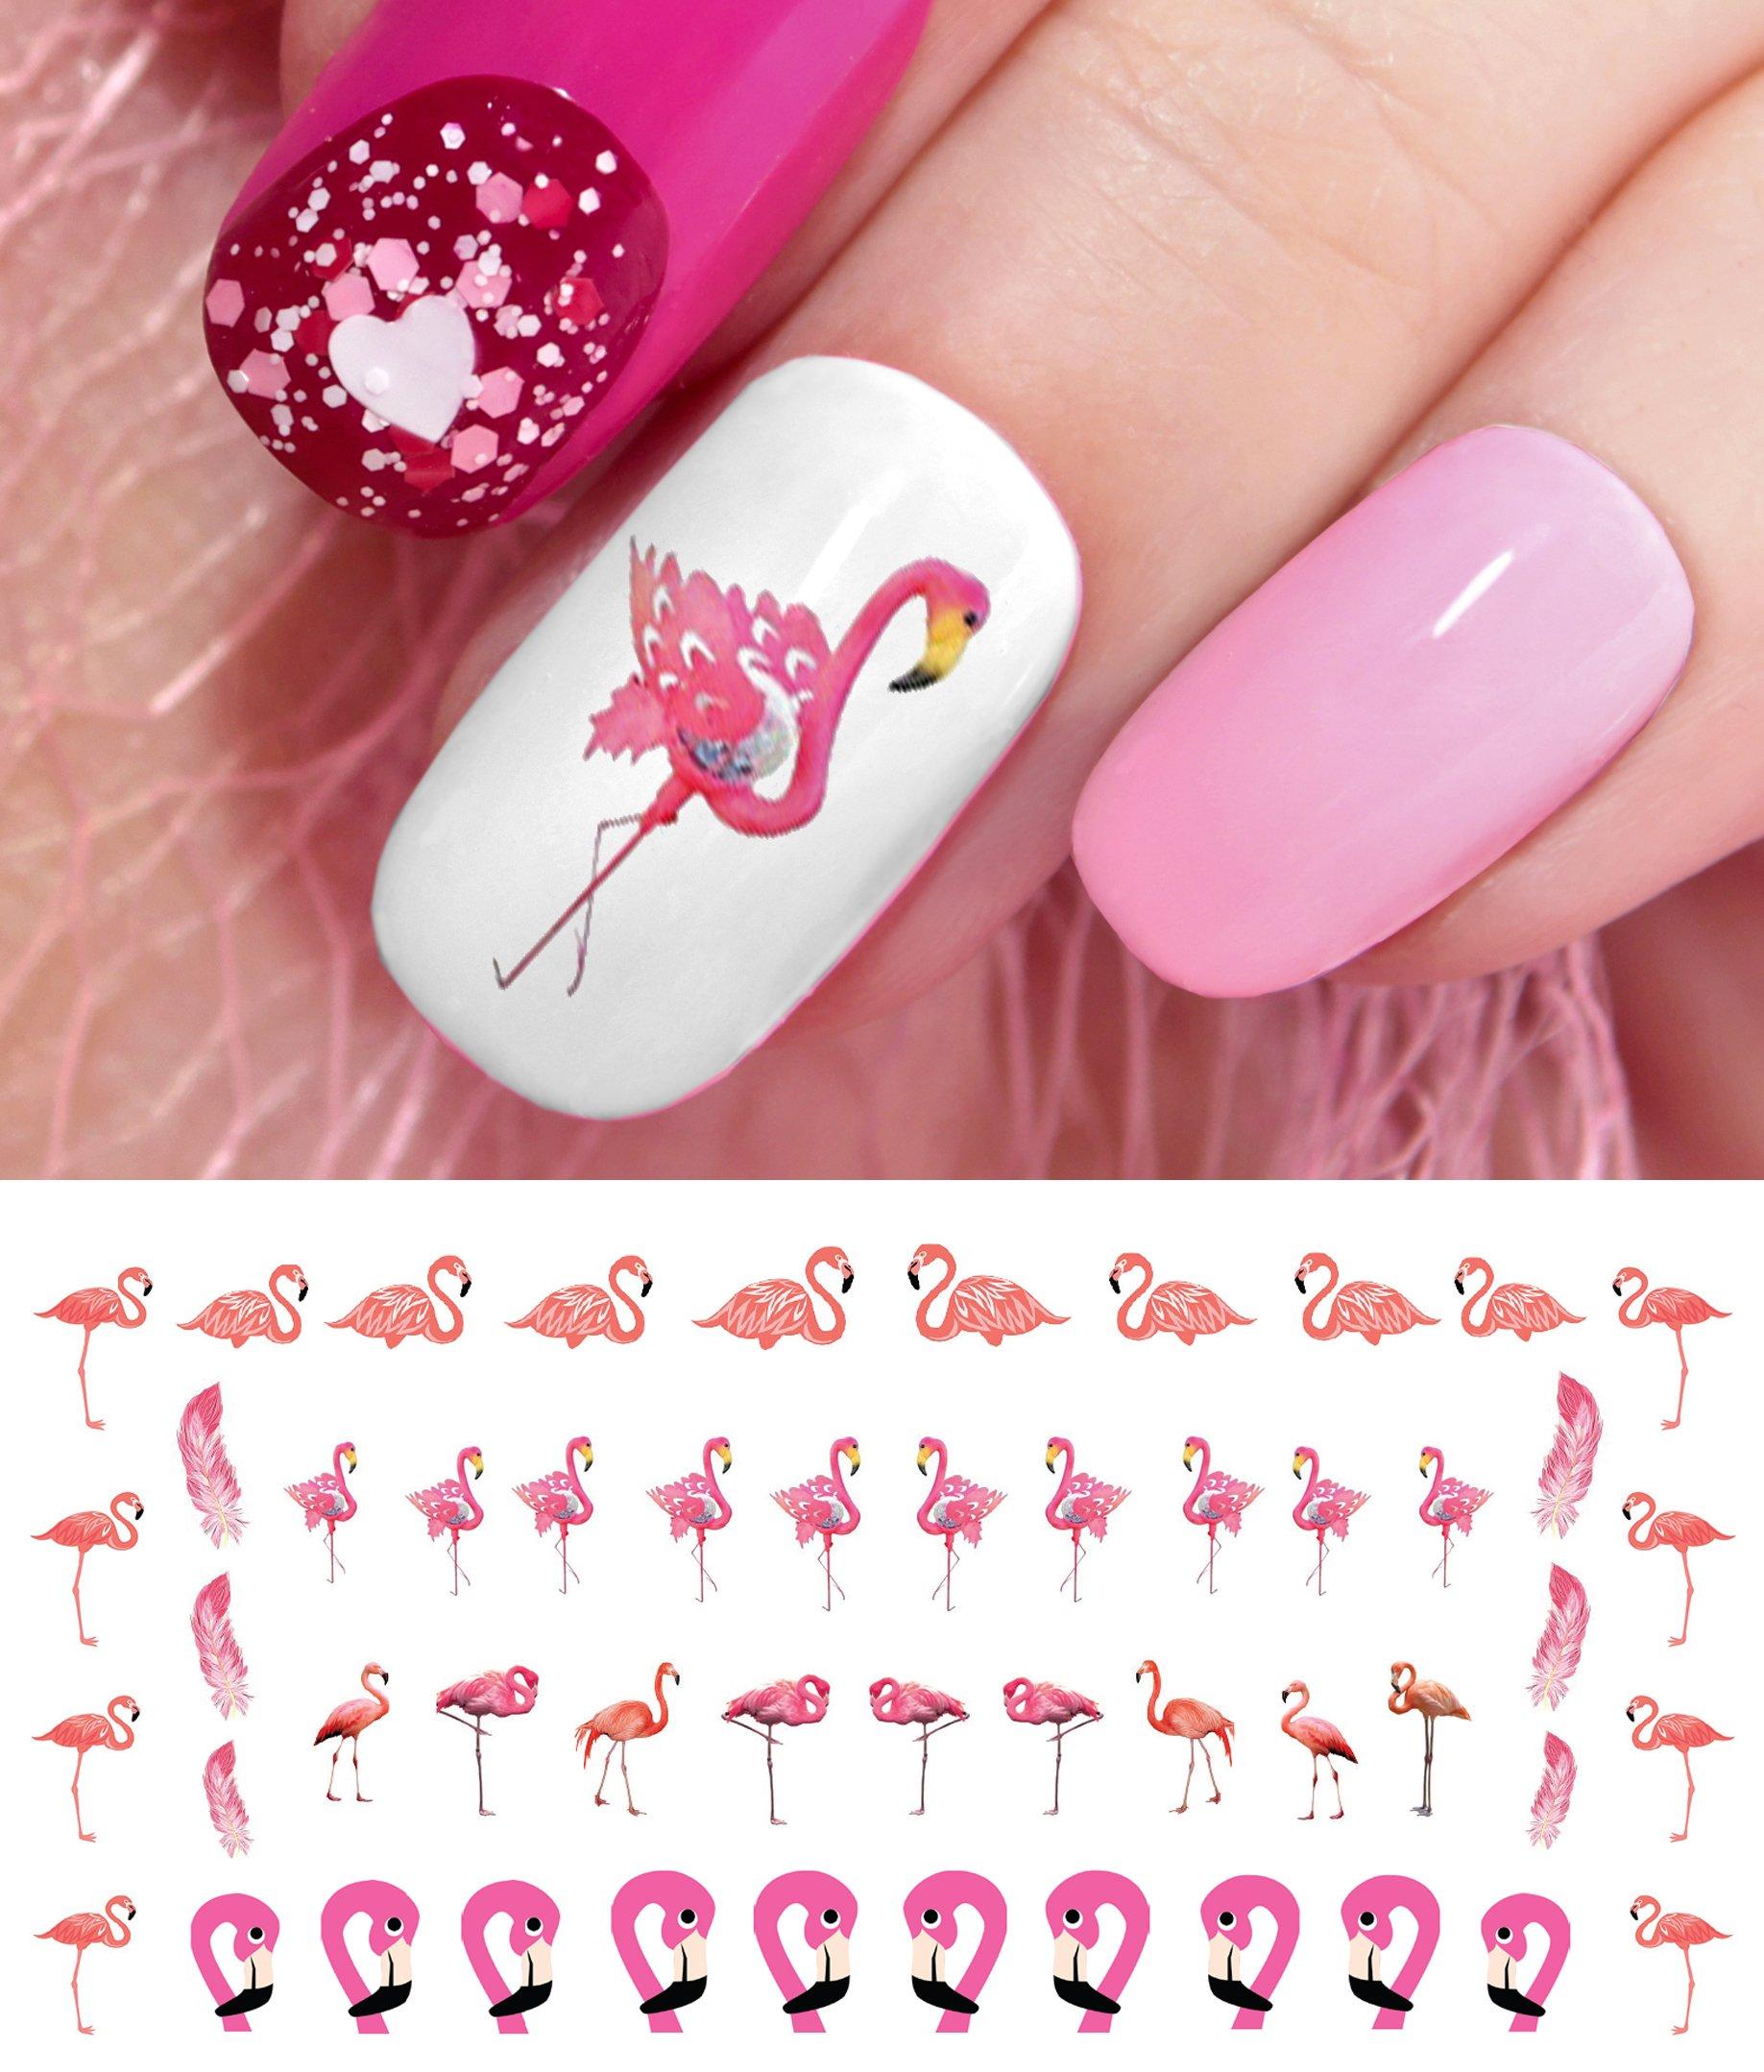 Amazon.com : Pink Flamingo Nail Art Decals : Beauty